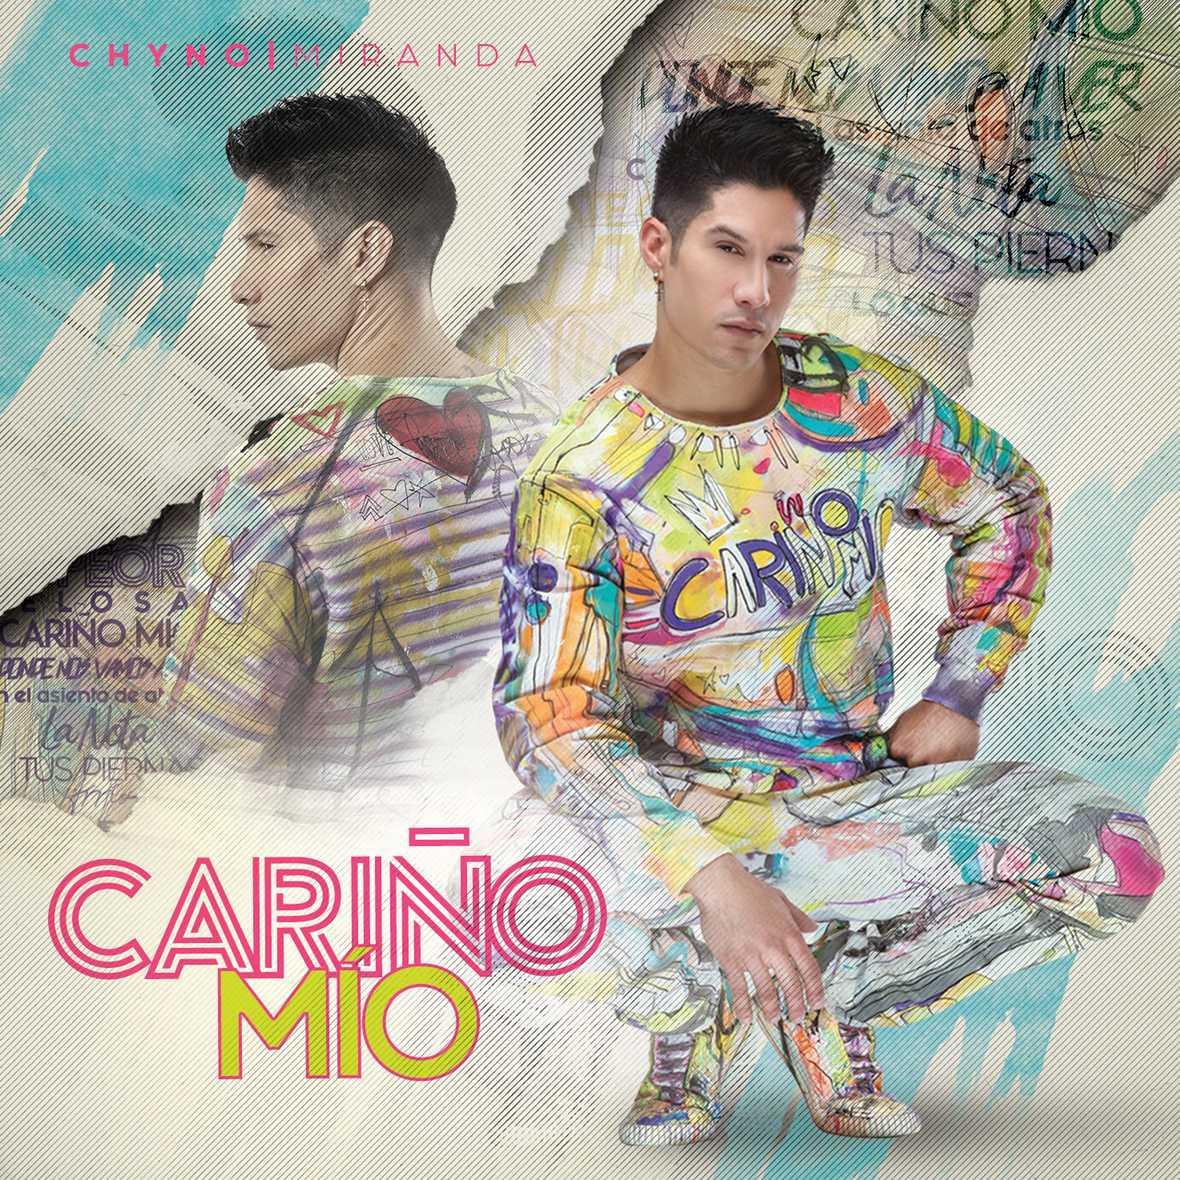 COVER OFICIAL ALBUM CARINO MIO